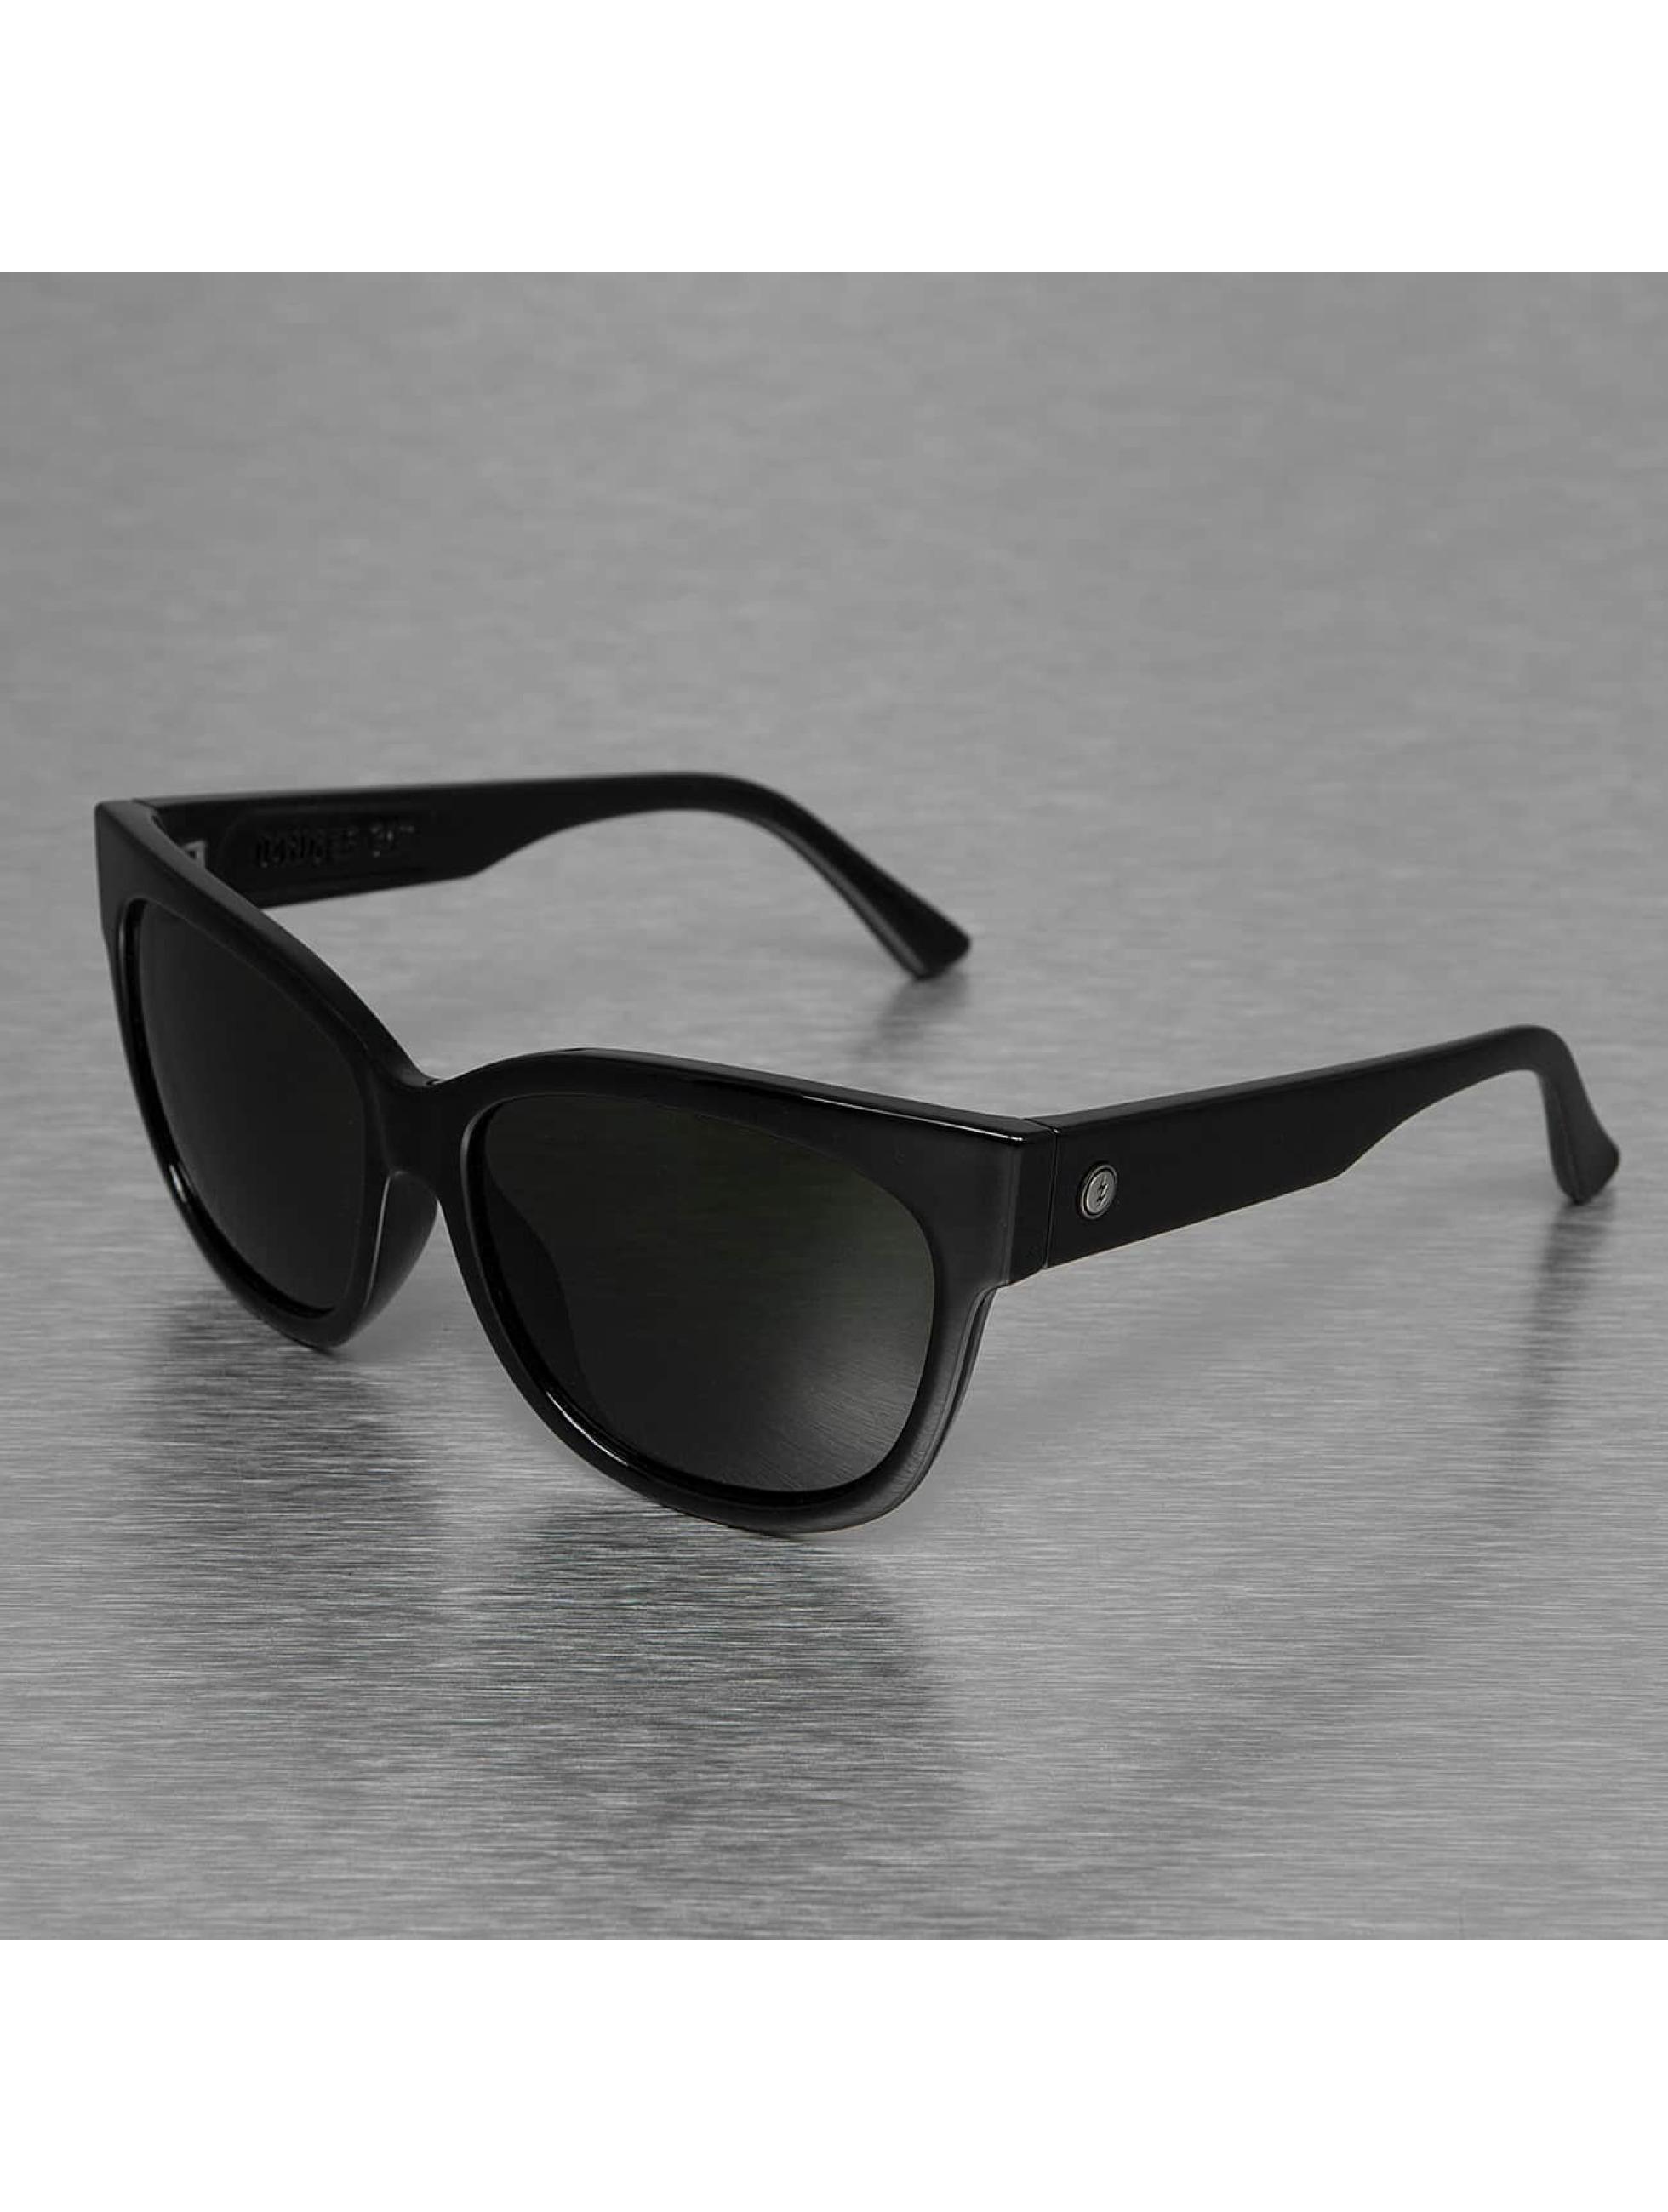 Electric Sunglasses DANGER CAT black